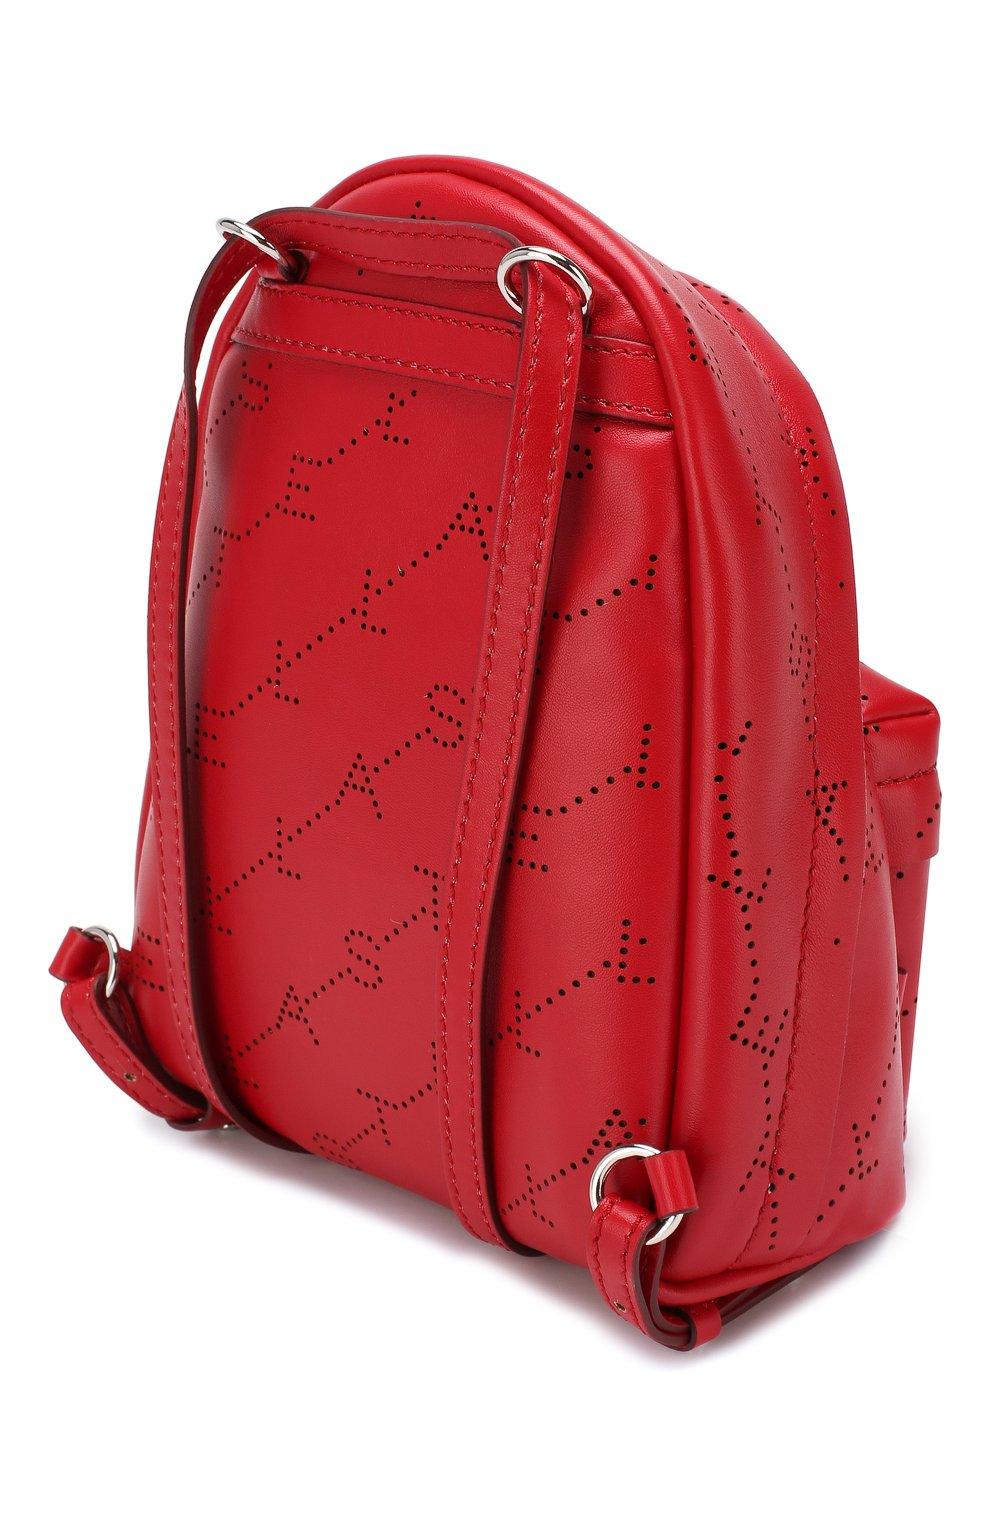 Рюкзак Monogram mini  Stella McCartney красный | Фото №3